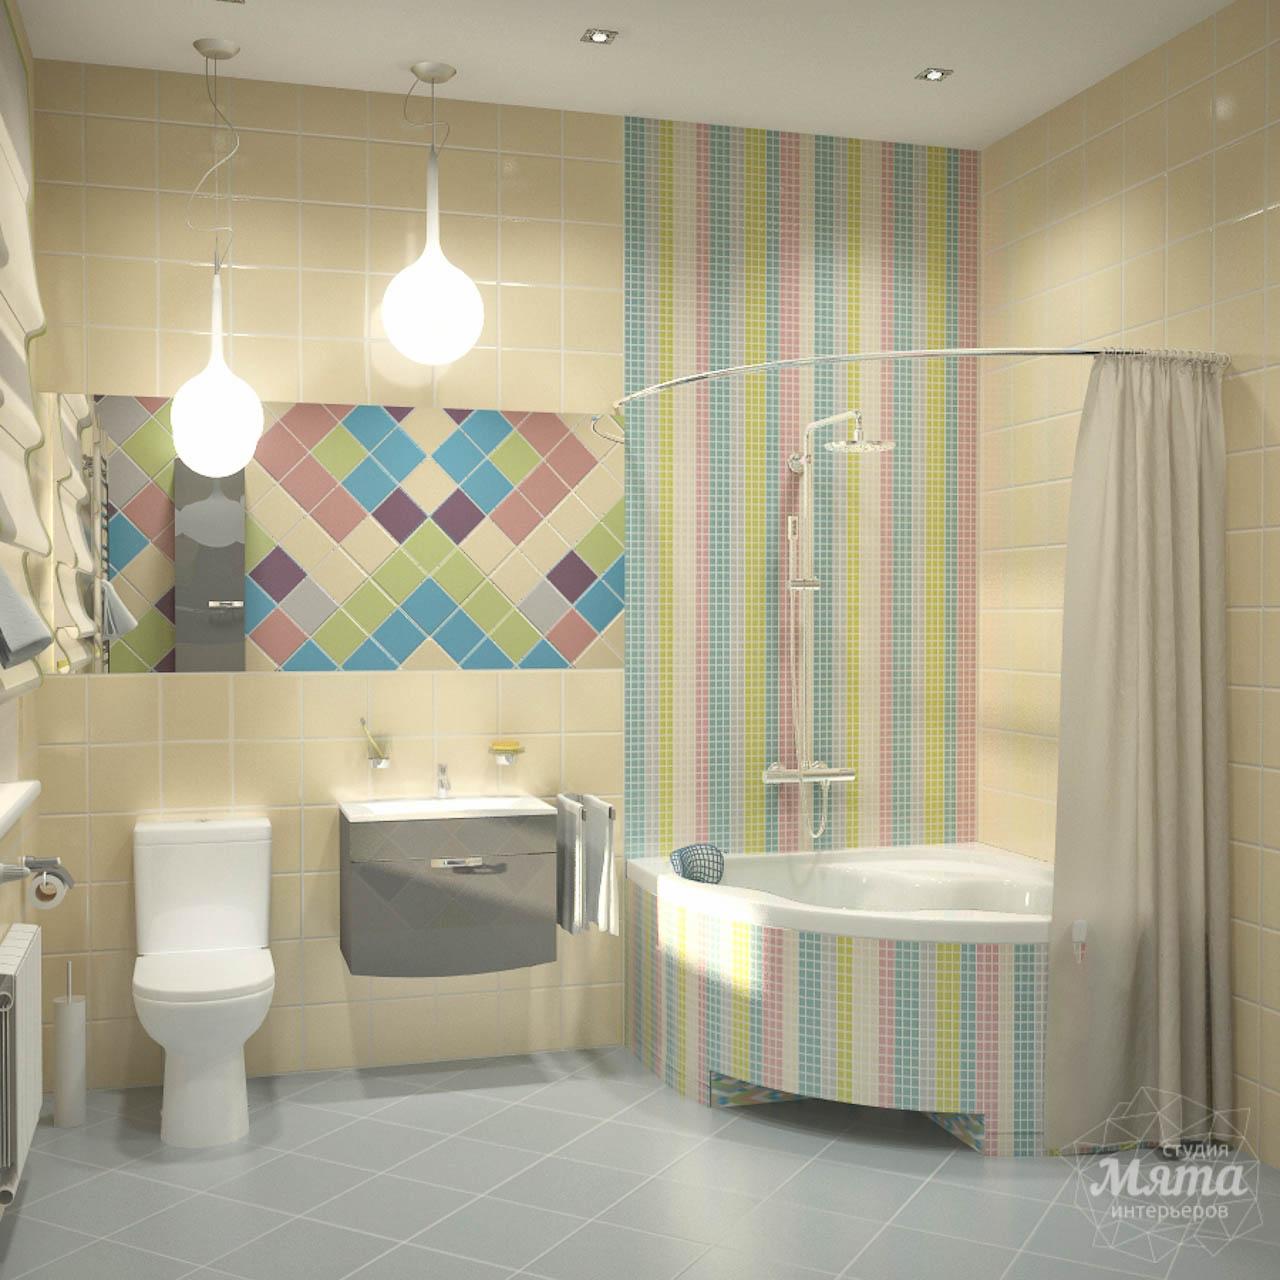 Дизайн проект интерьера коттеджа  в стиле минимализм по ул. Барвинка 15 img2051685113